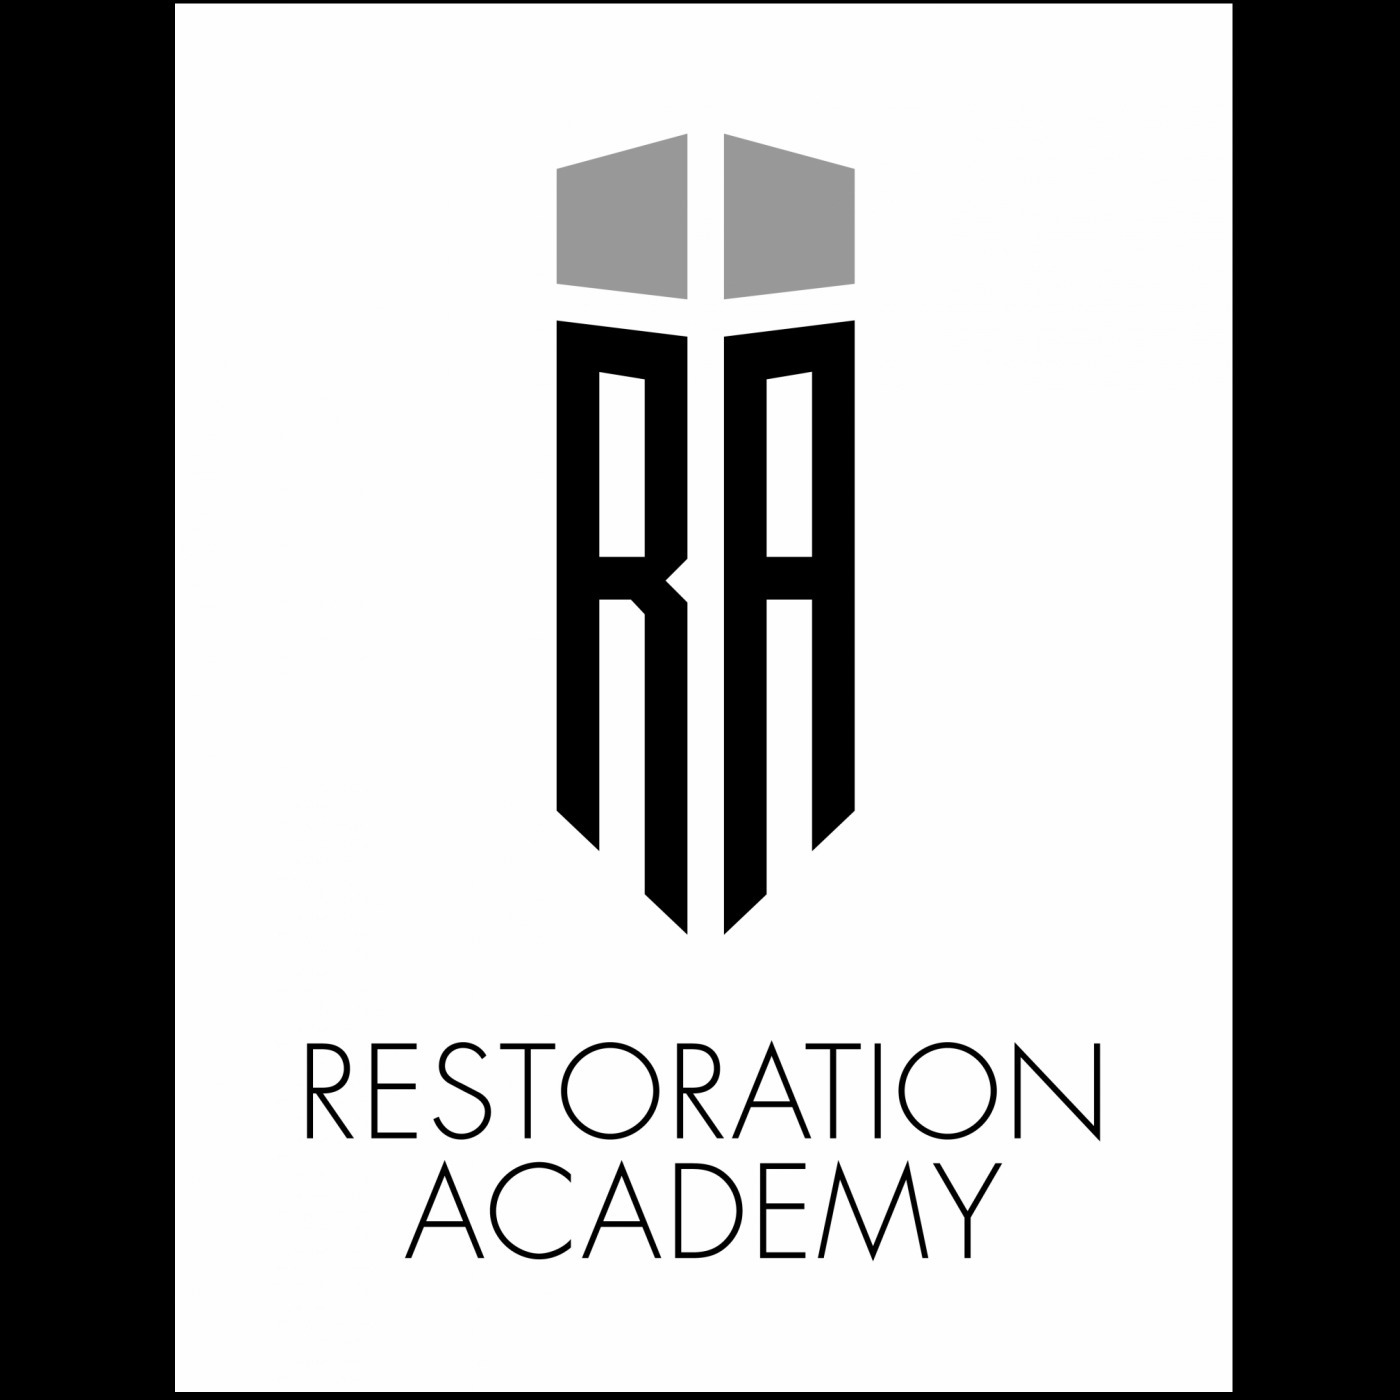 Restoration Academy Luncheons